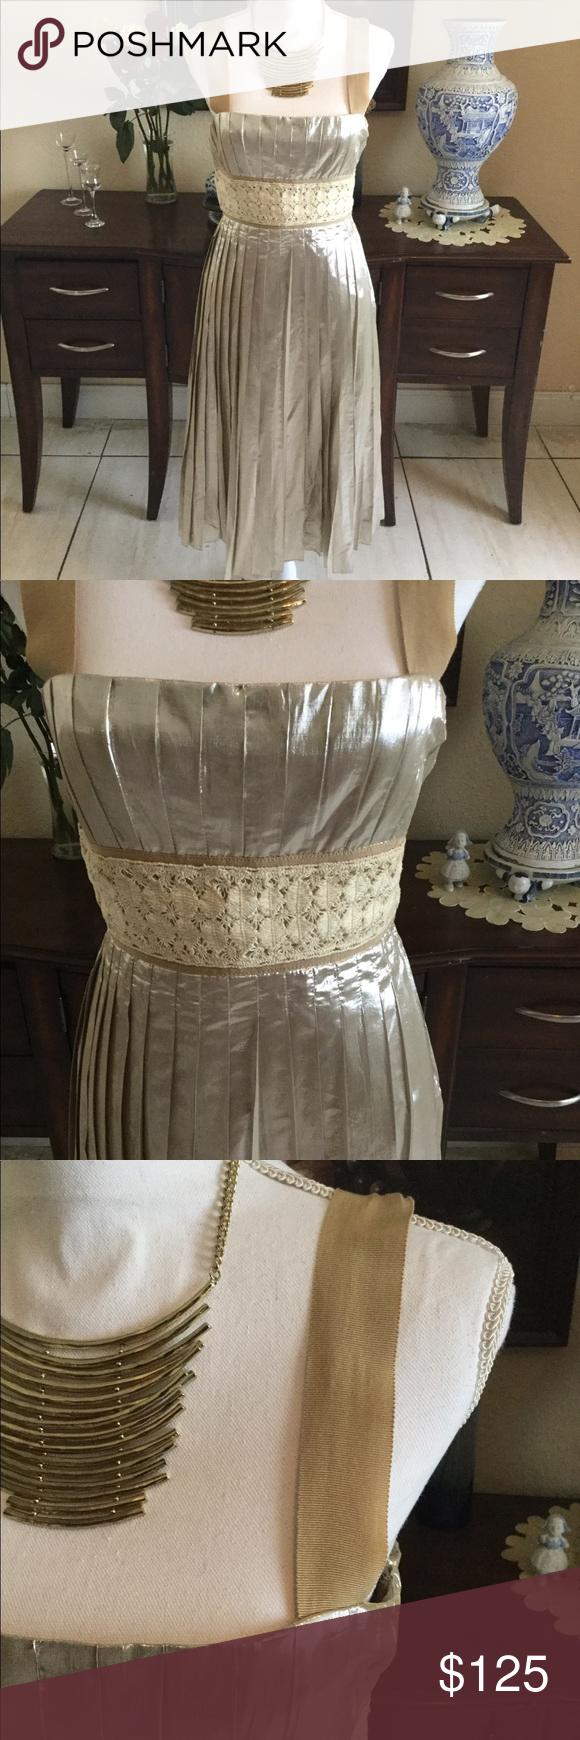 Malandrino cream and gold pleated dress my posh picks